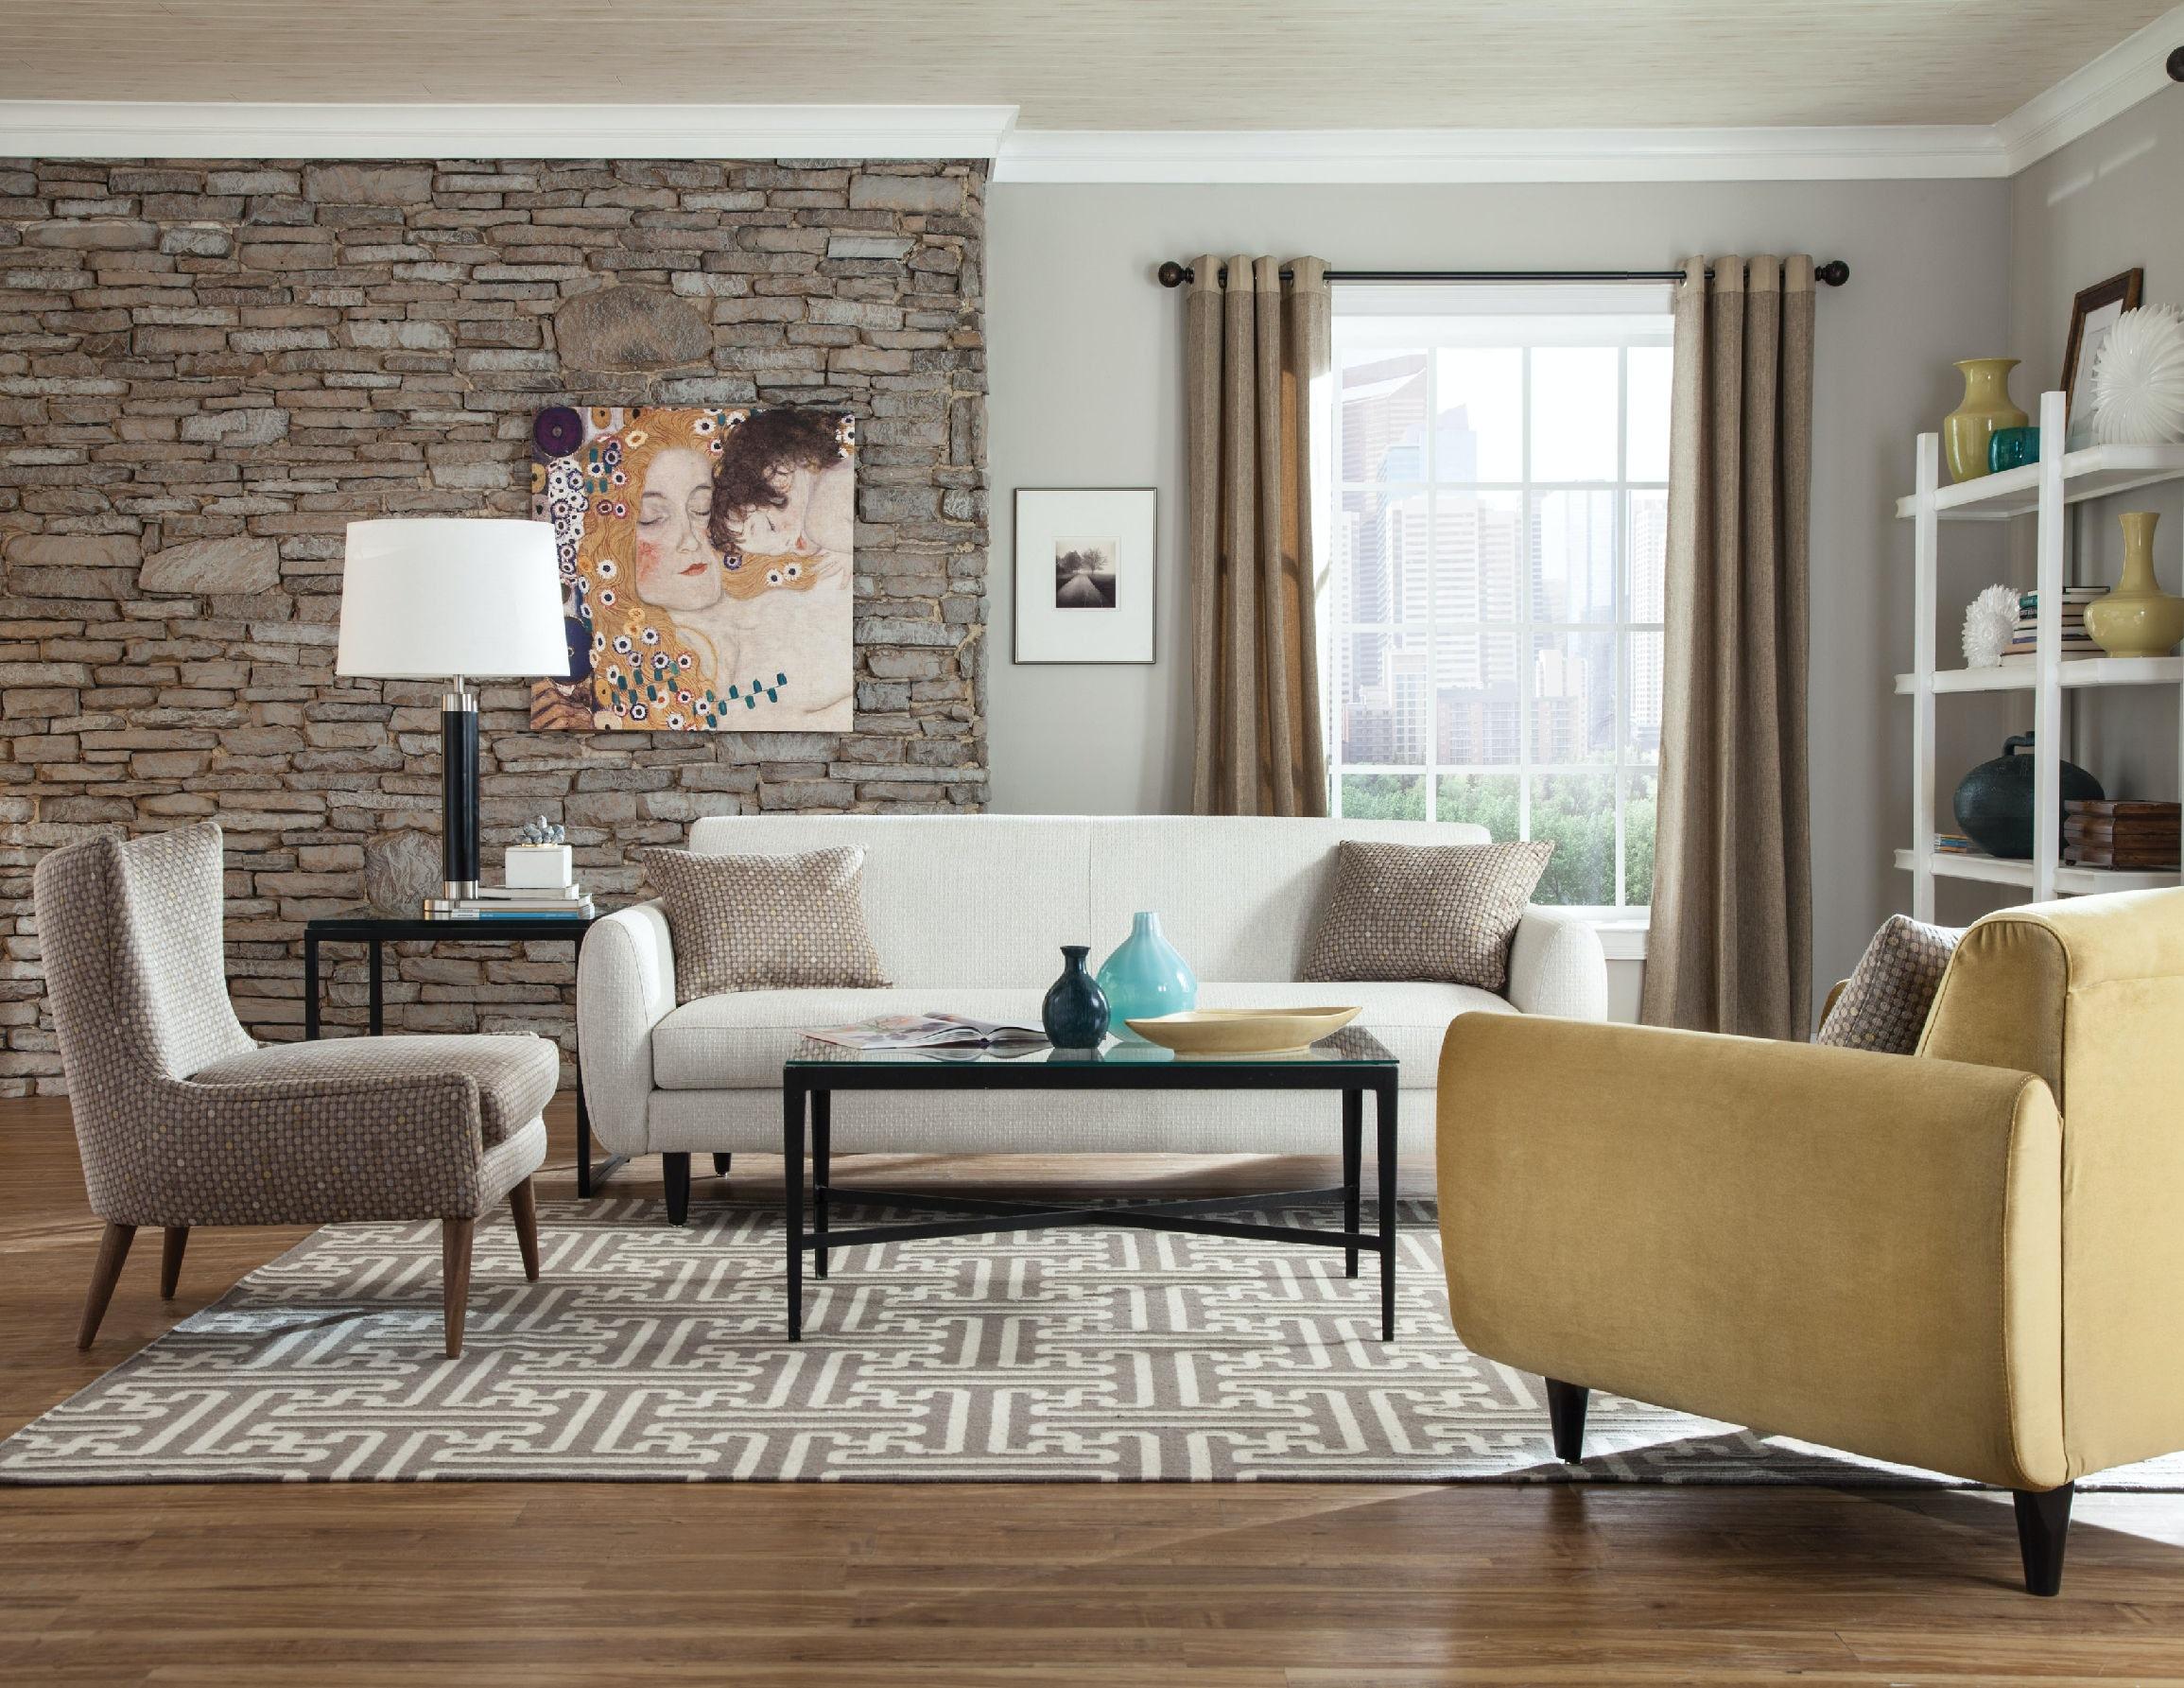 26030. Sofa · Carol House Discount Price $747.00